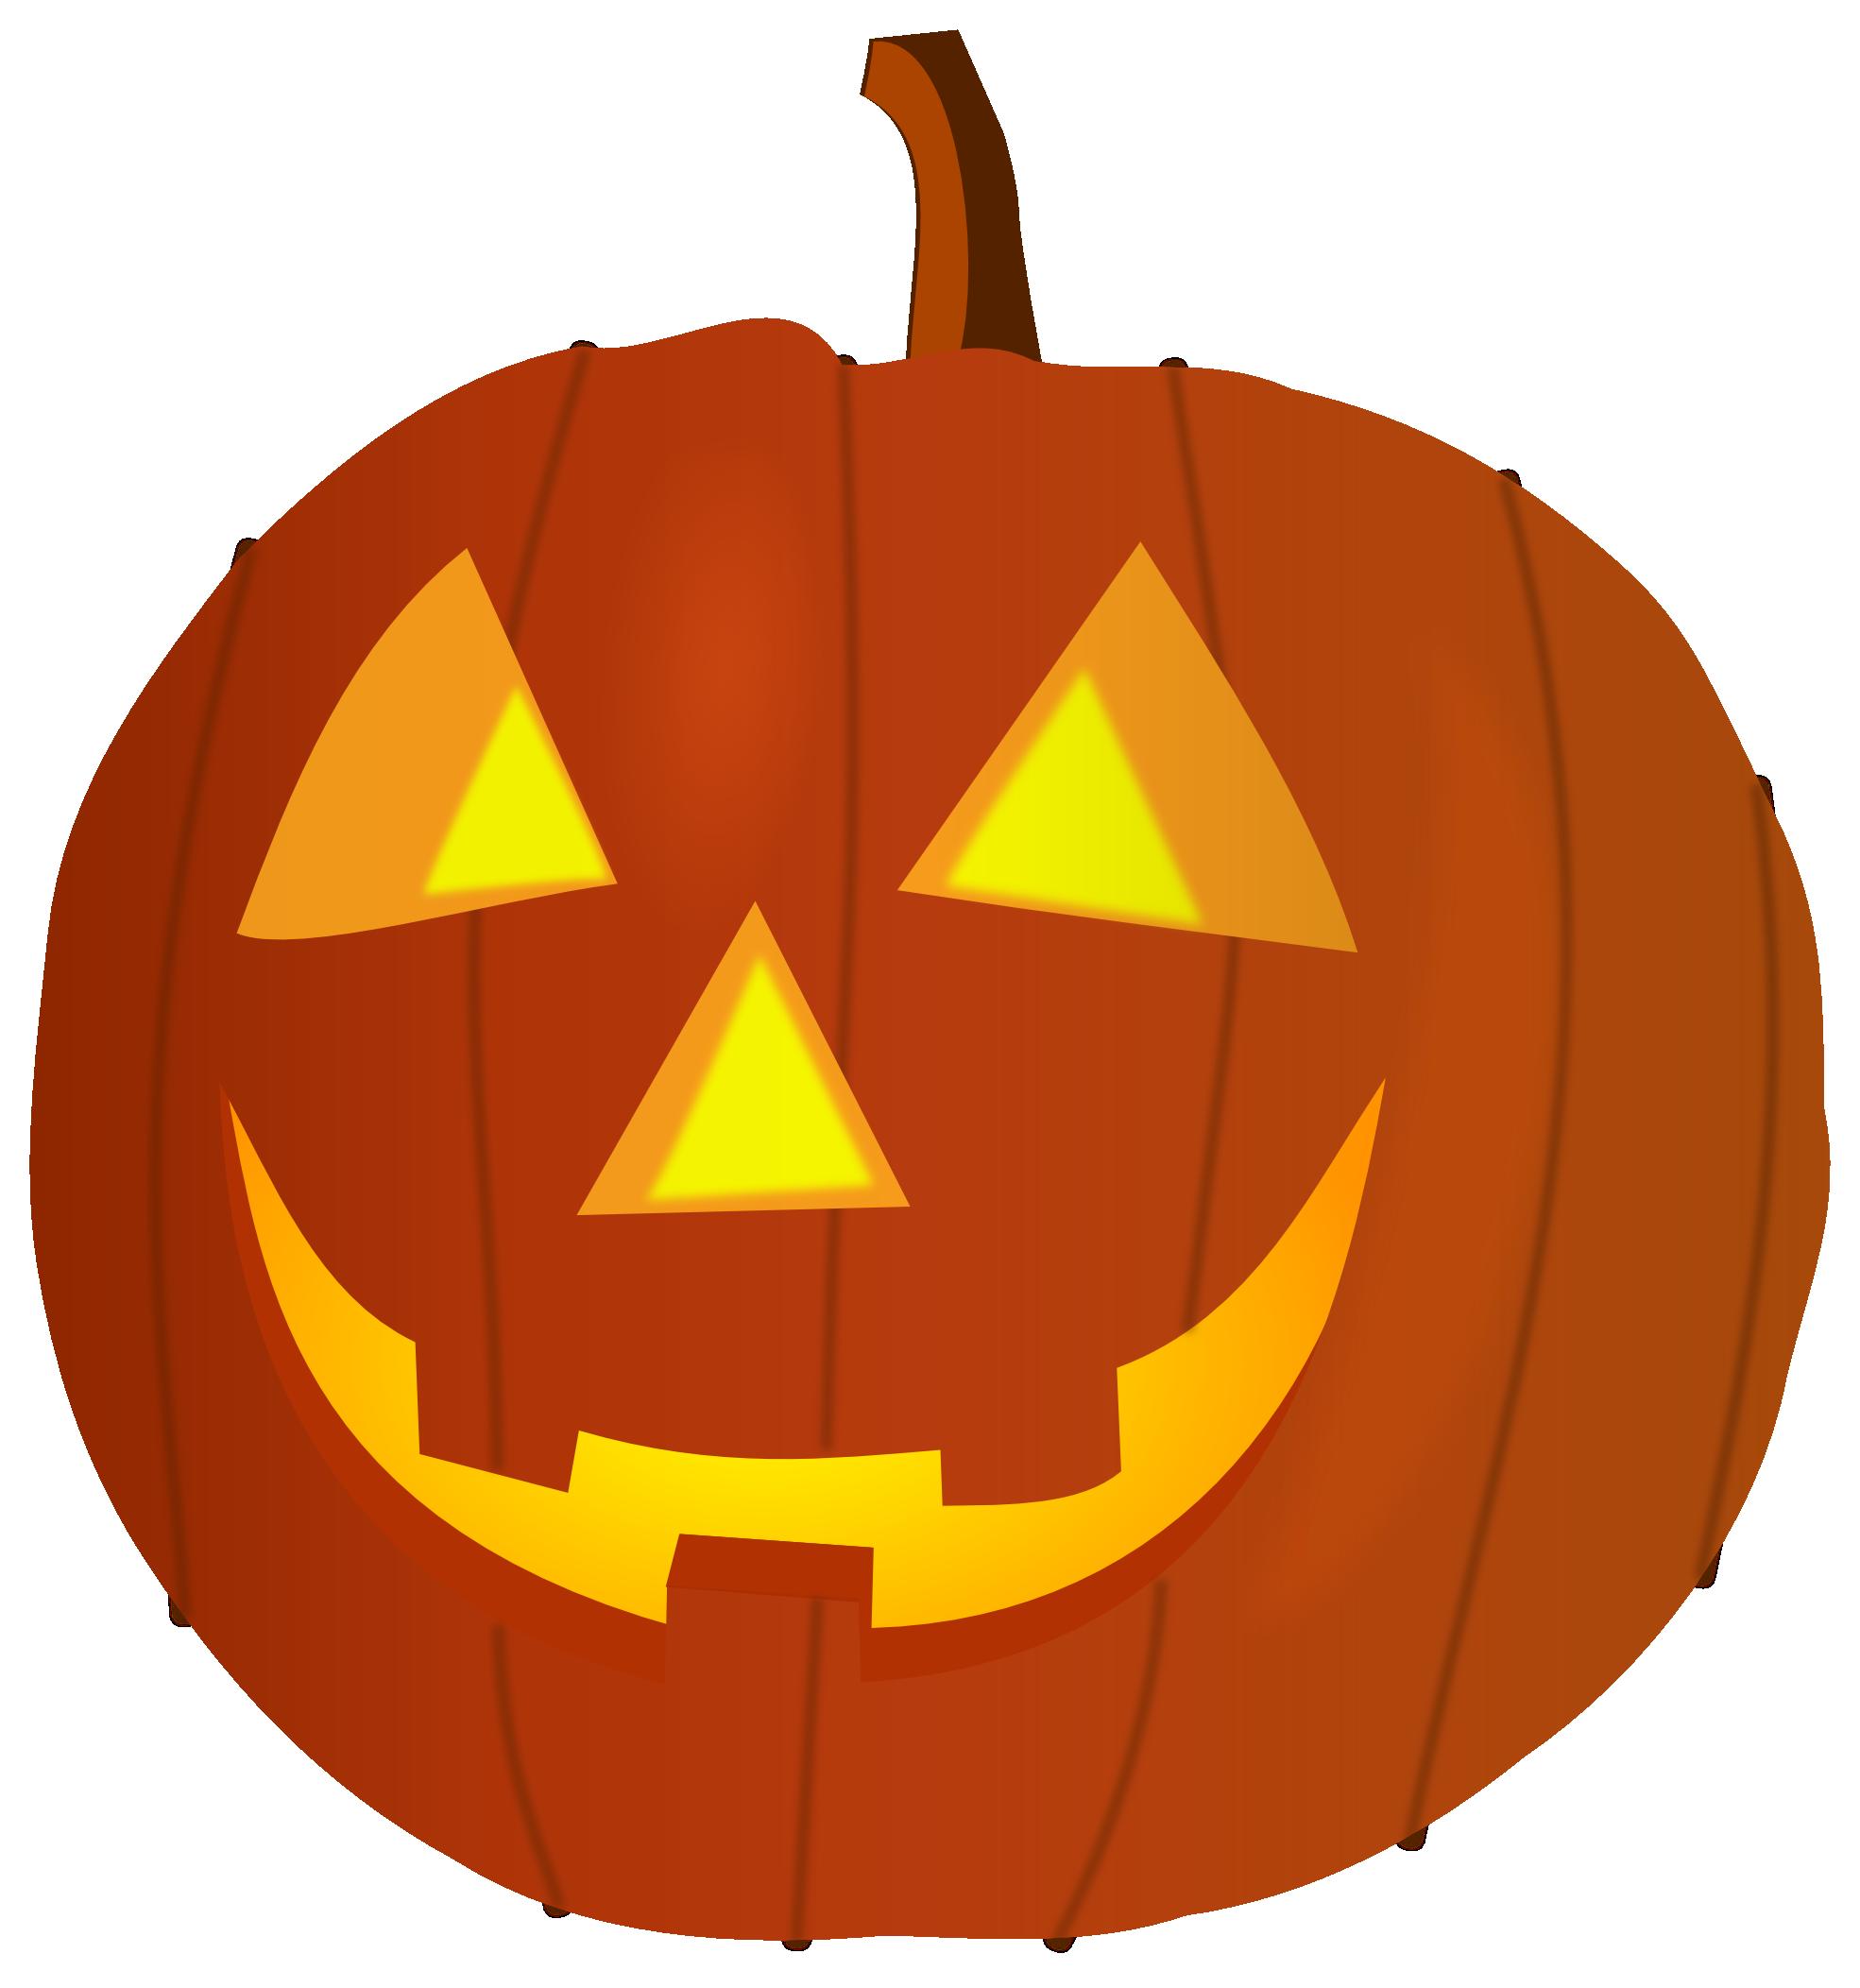 Halloween alligator pumpkin clipart vector black and white stock clipartist.net » Halloween vector black and white stock